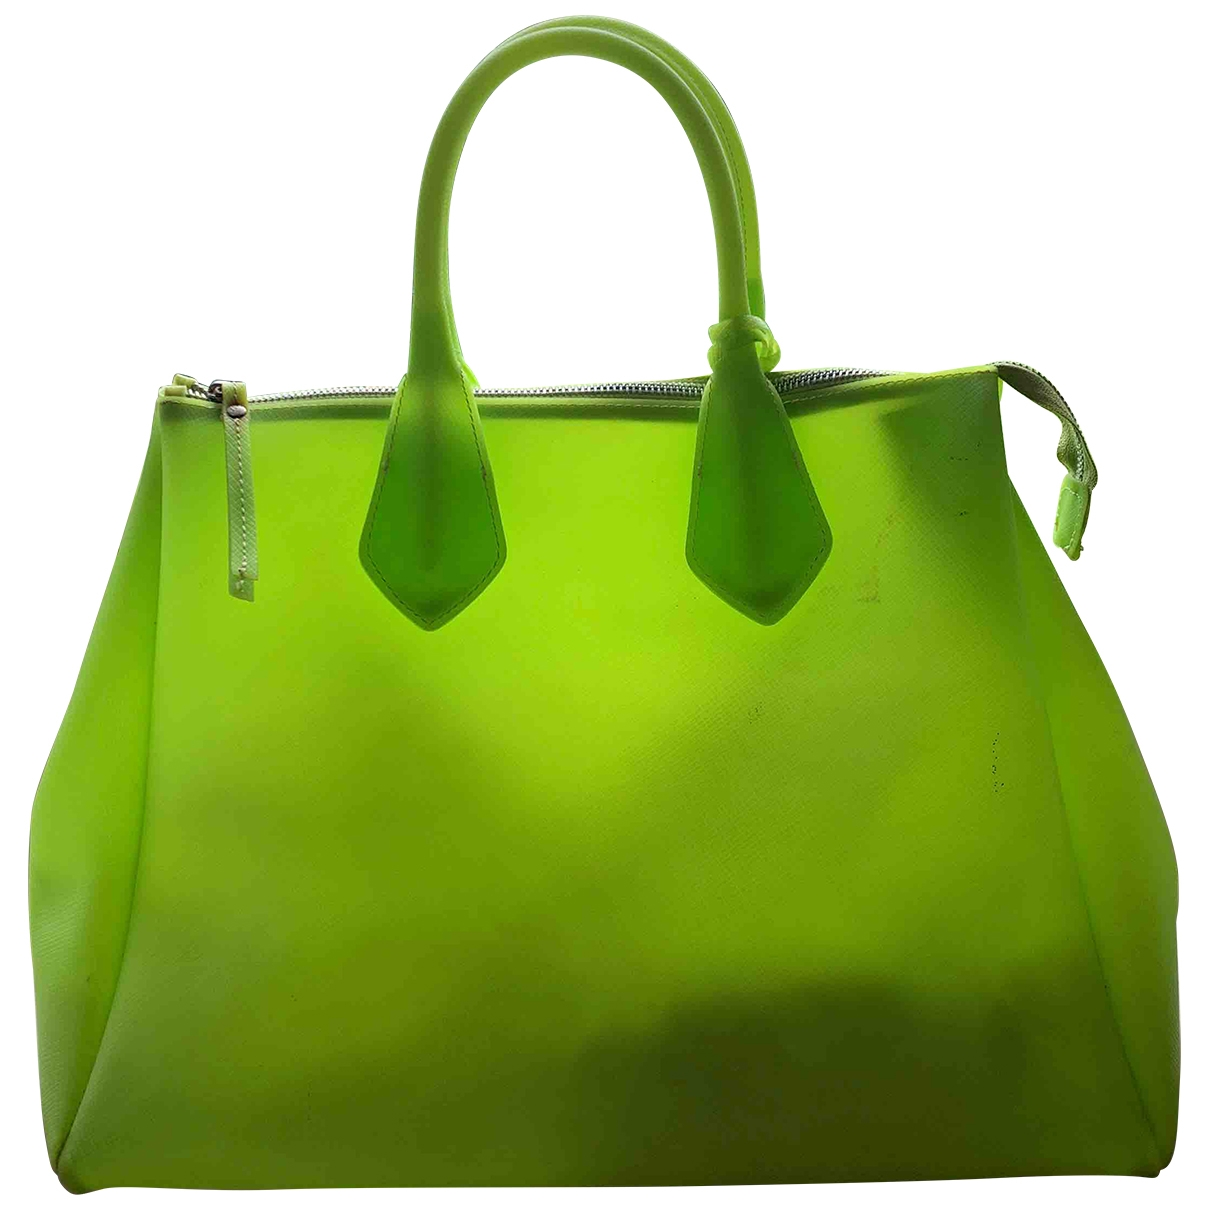 Gianni Chiarini \N Handtasche in  Gruen Kunststoff